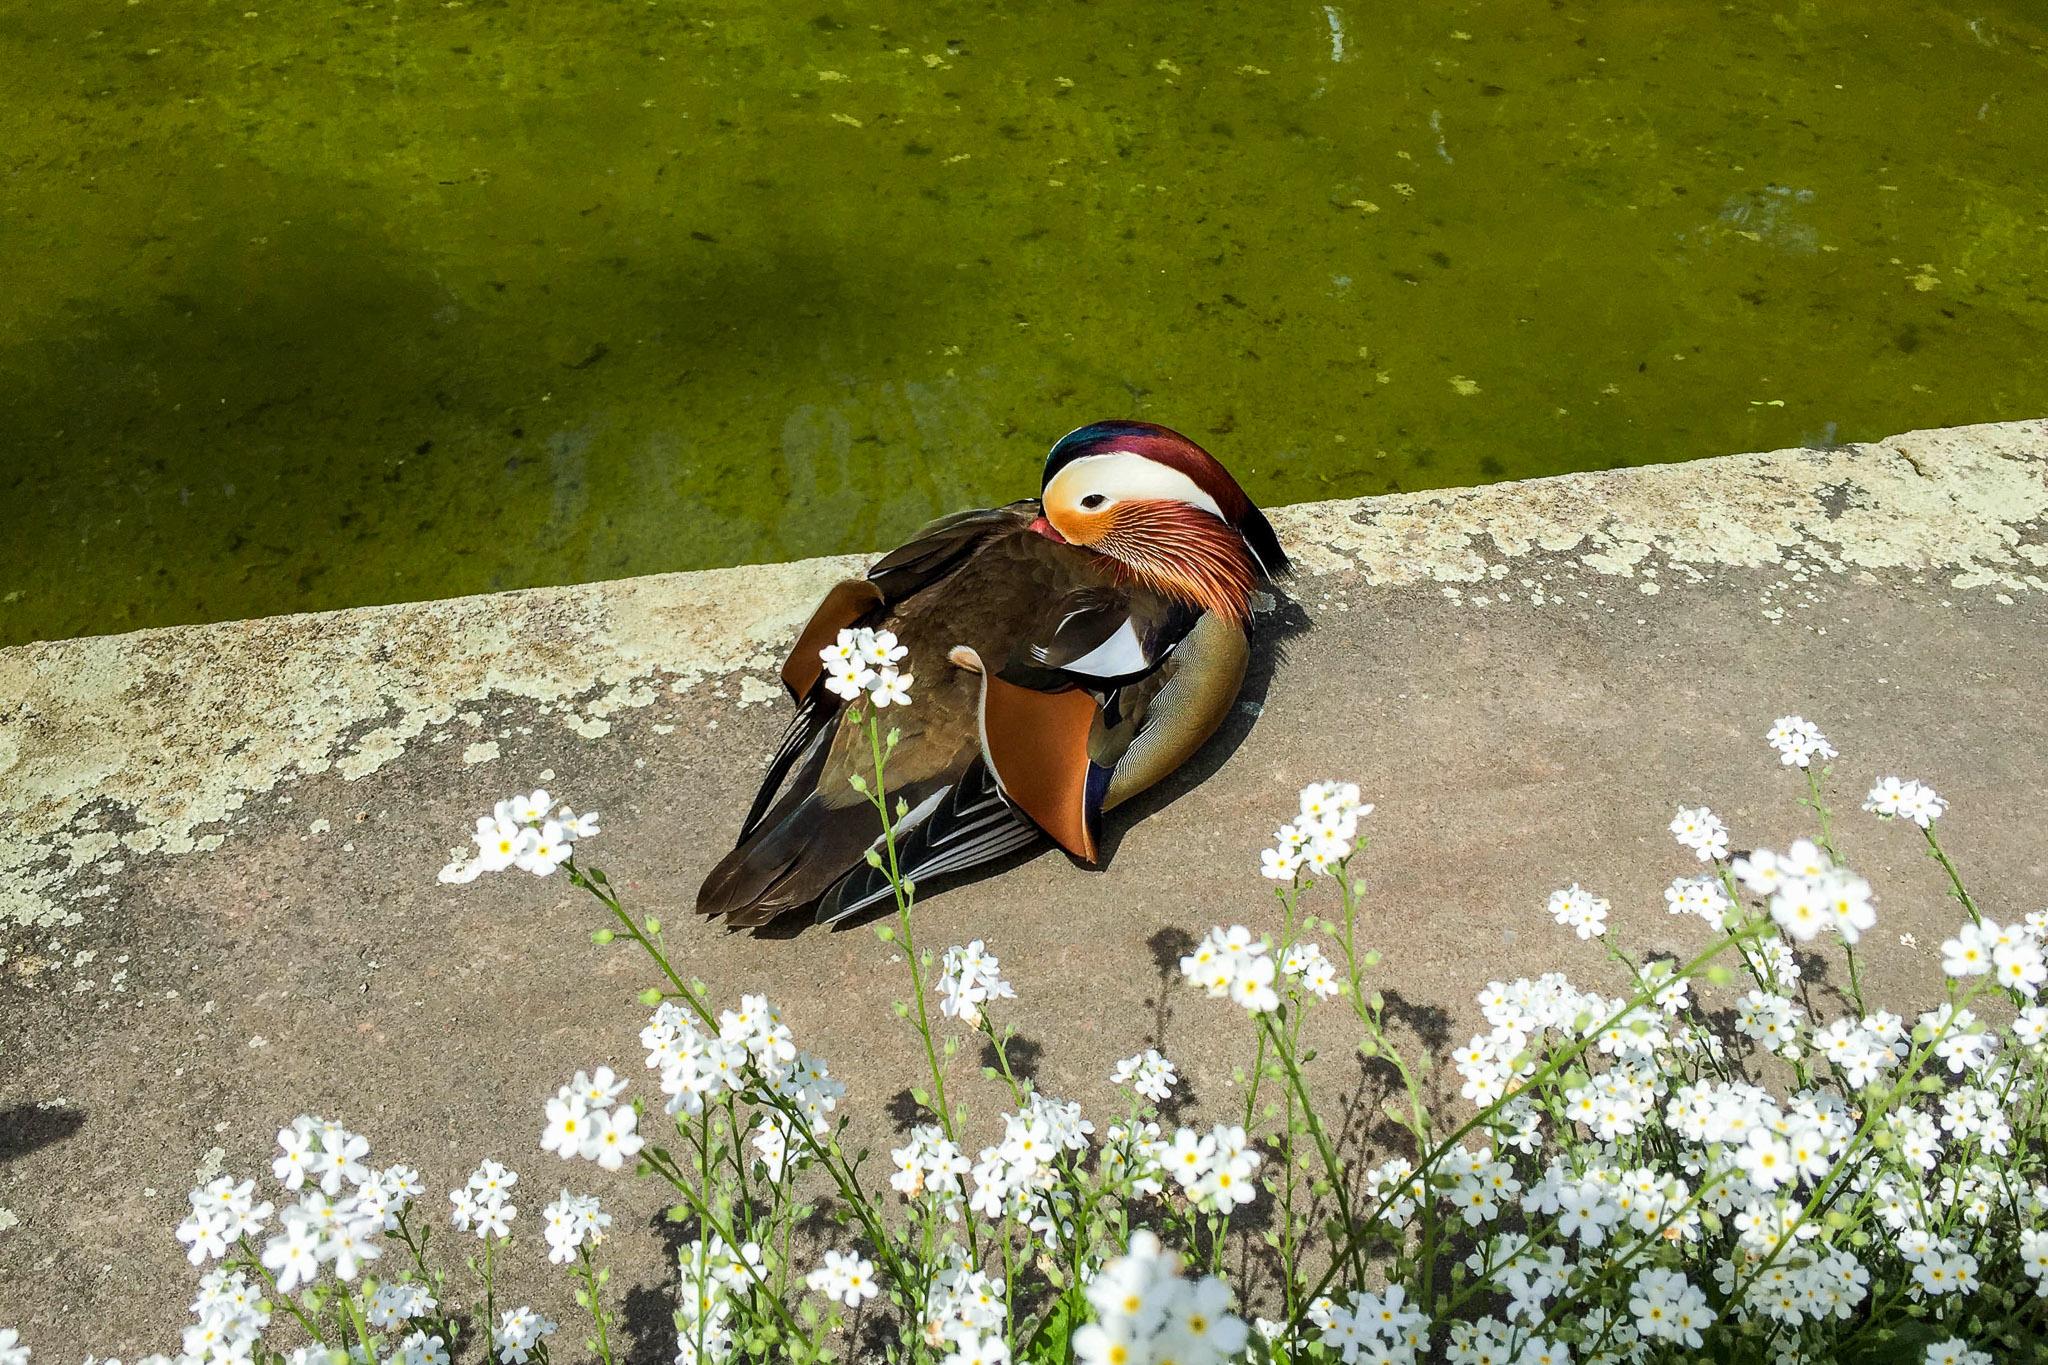 Polish duck